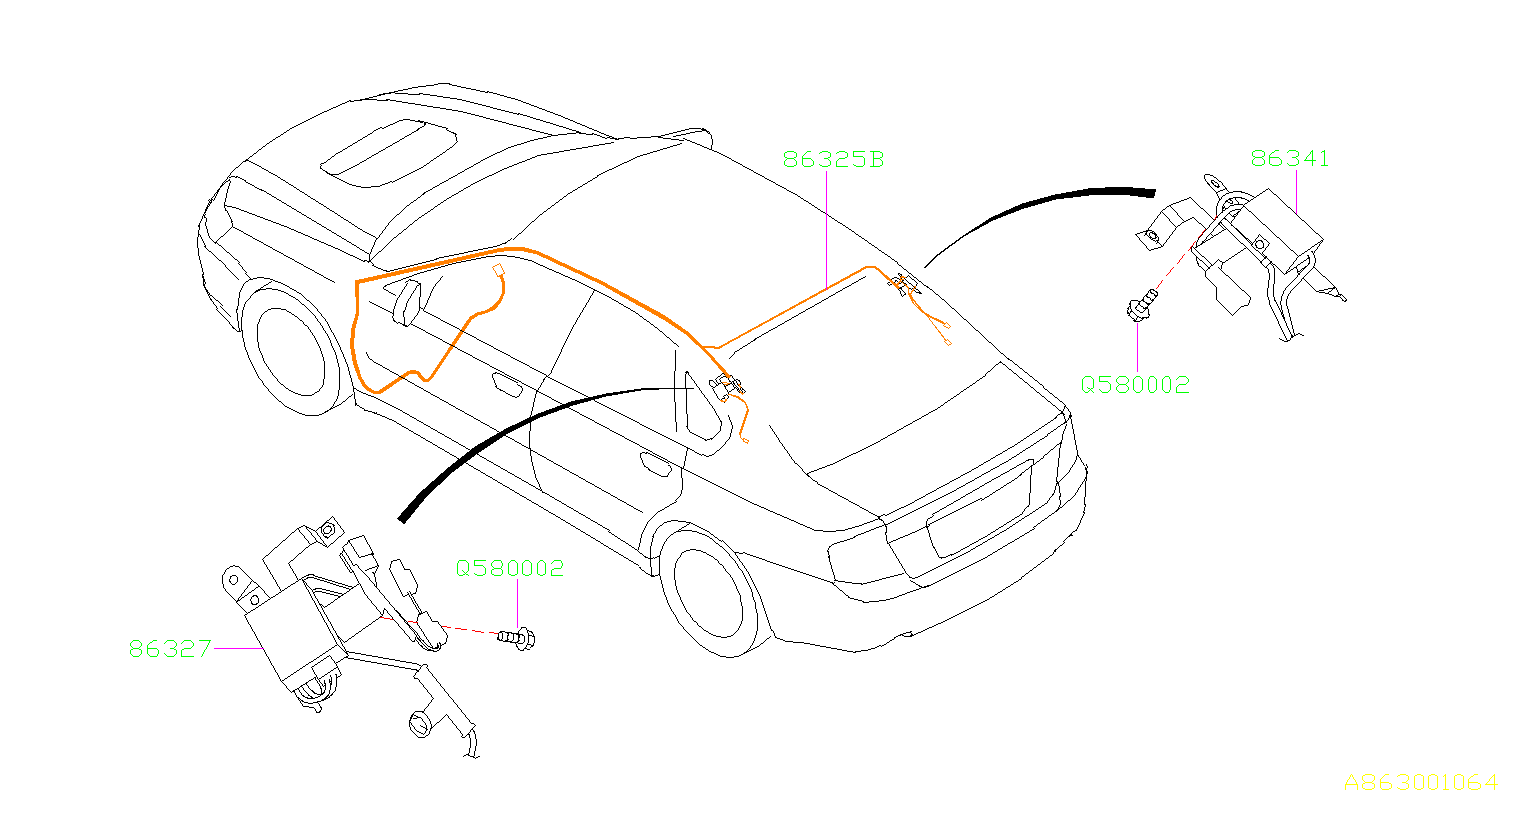 Subaru Outback Noise Suppressor Assembly Antenna